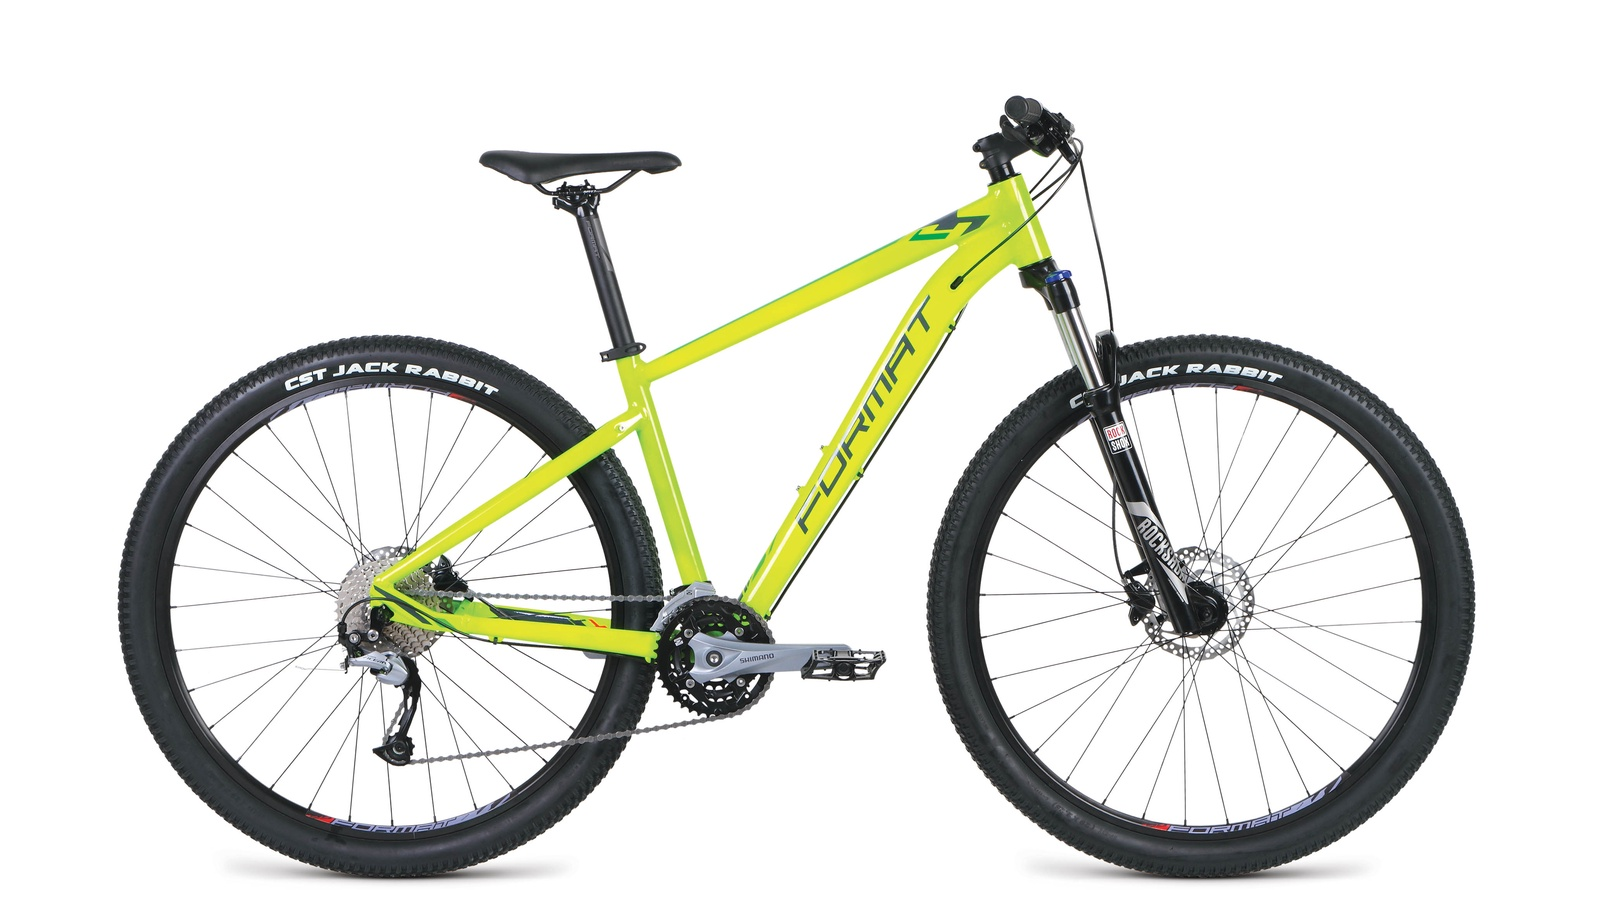 Велосипед Format RBKM9M69S005, желтый велосипед format 1113 2014